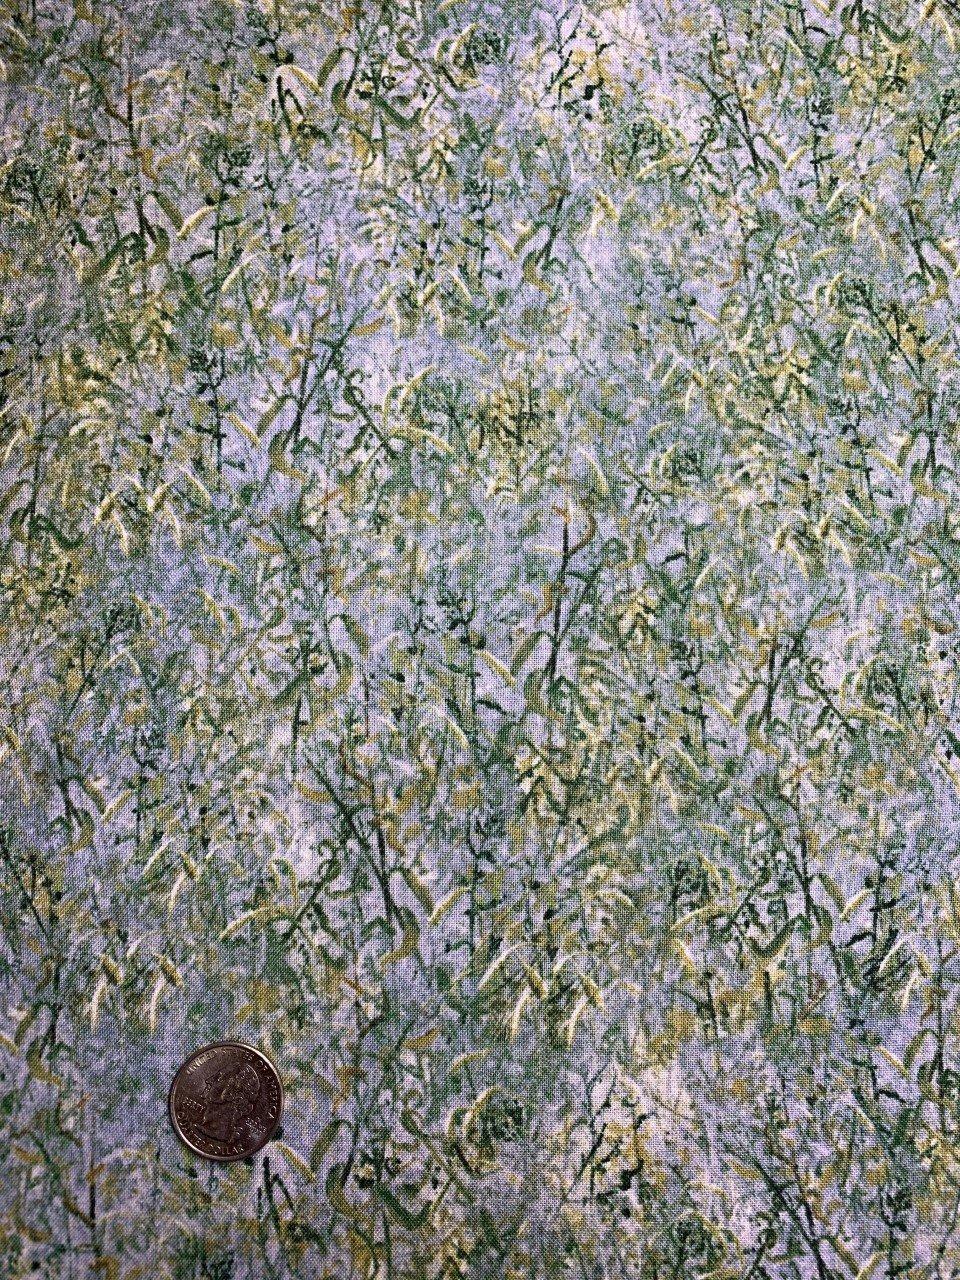 Whispering Winter - #1804-38530-747W - By Michelle Mara